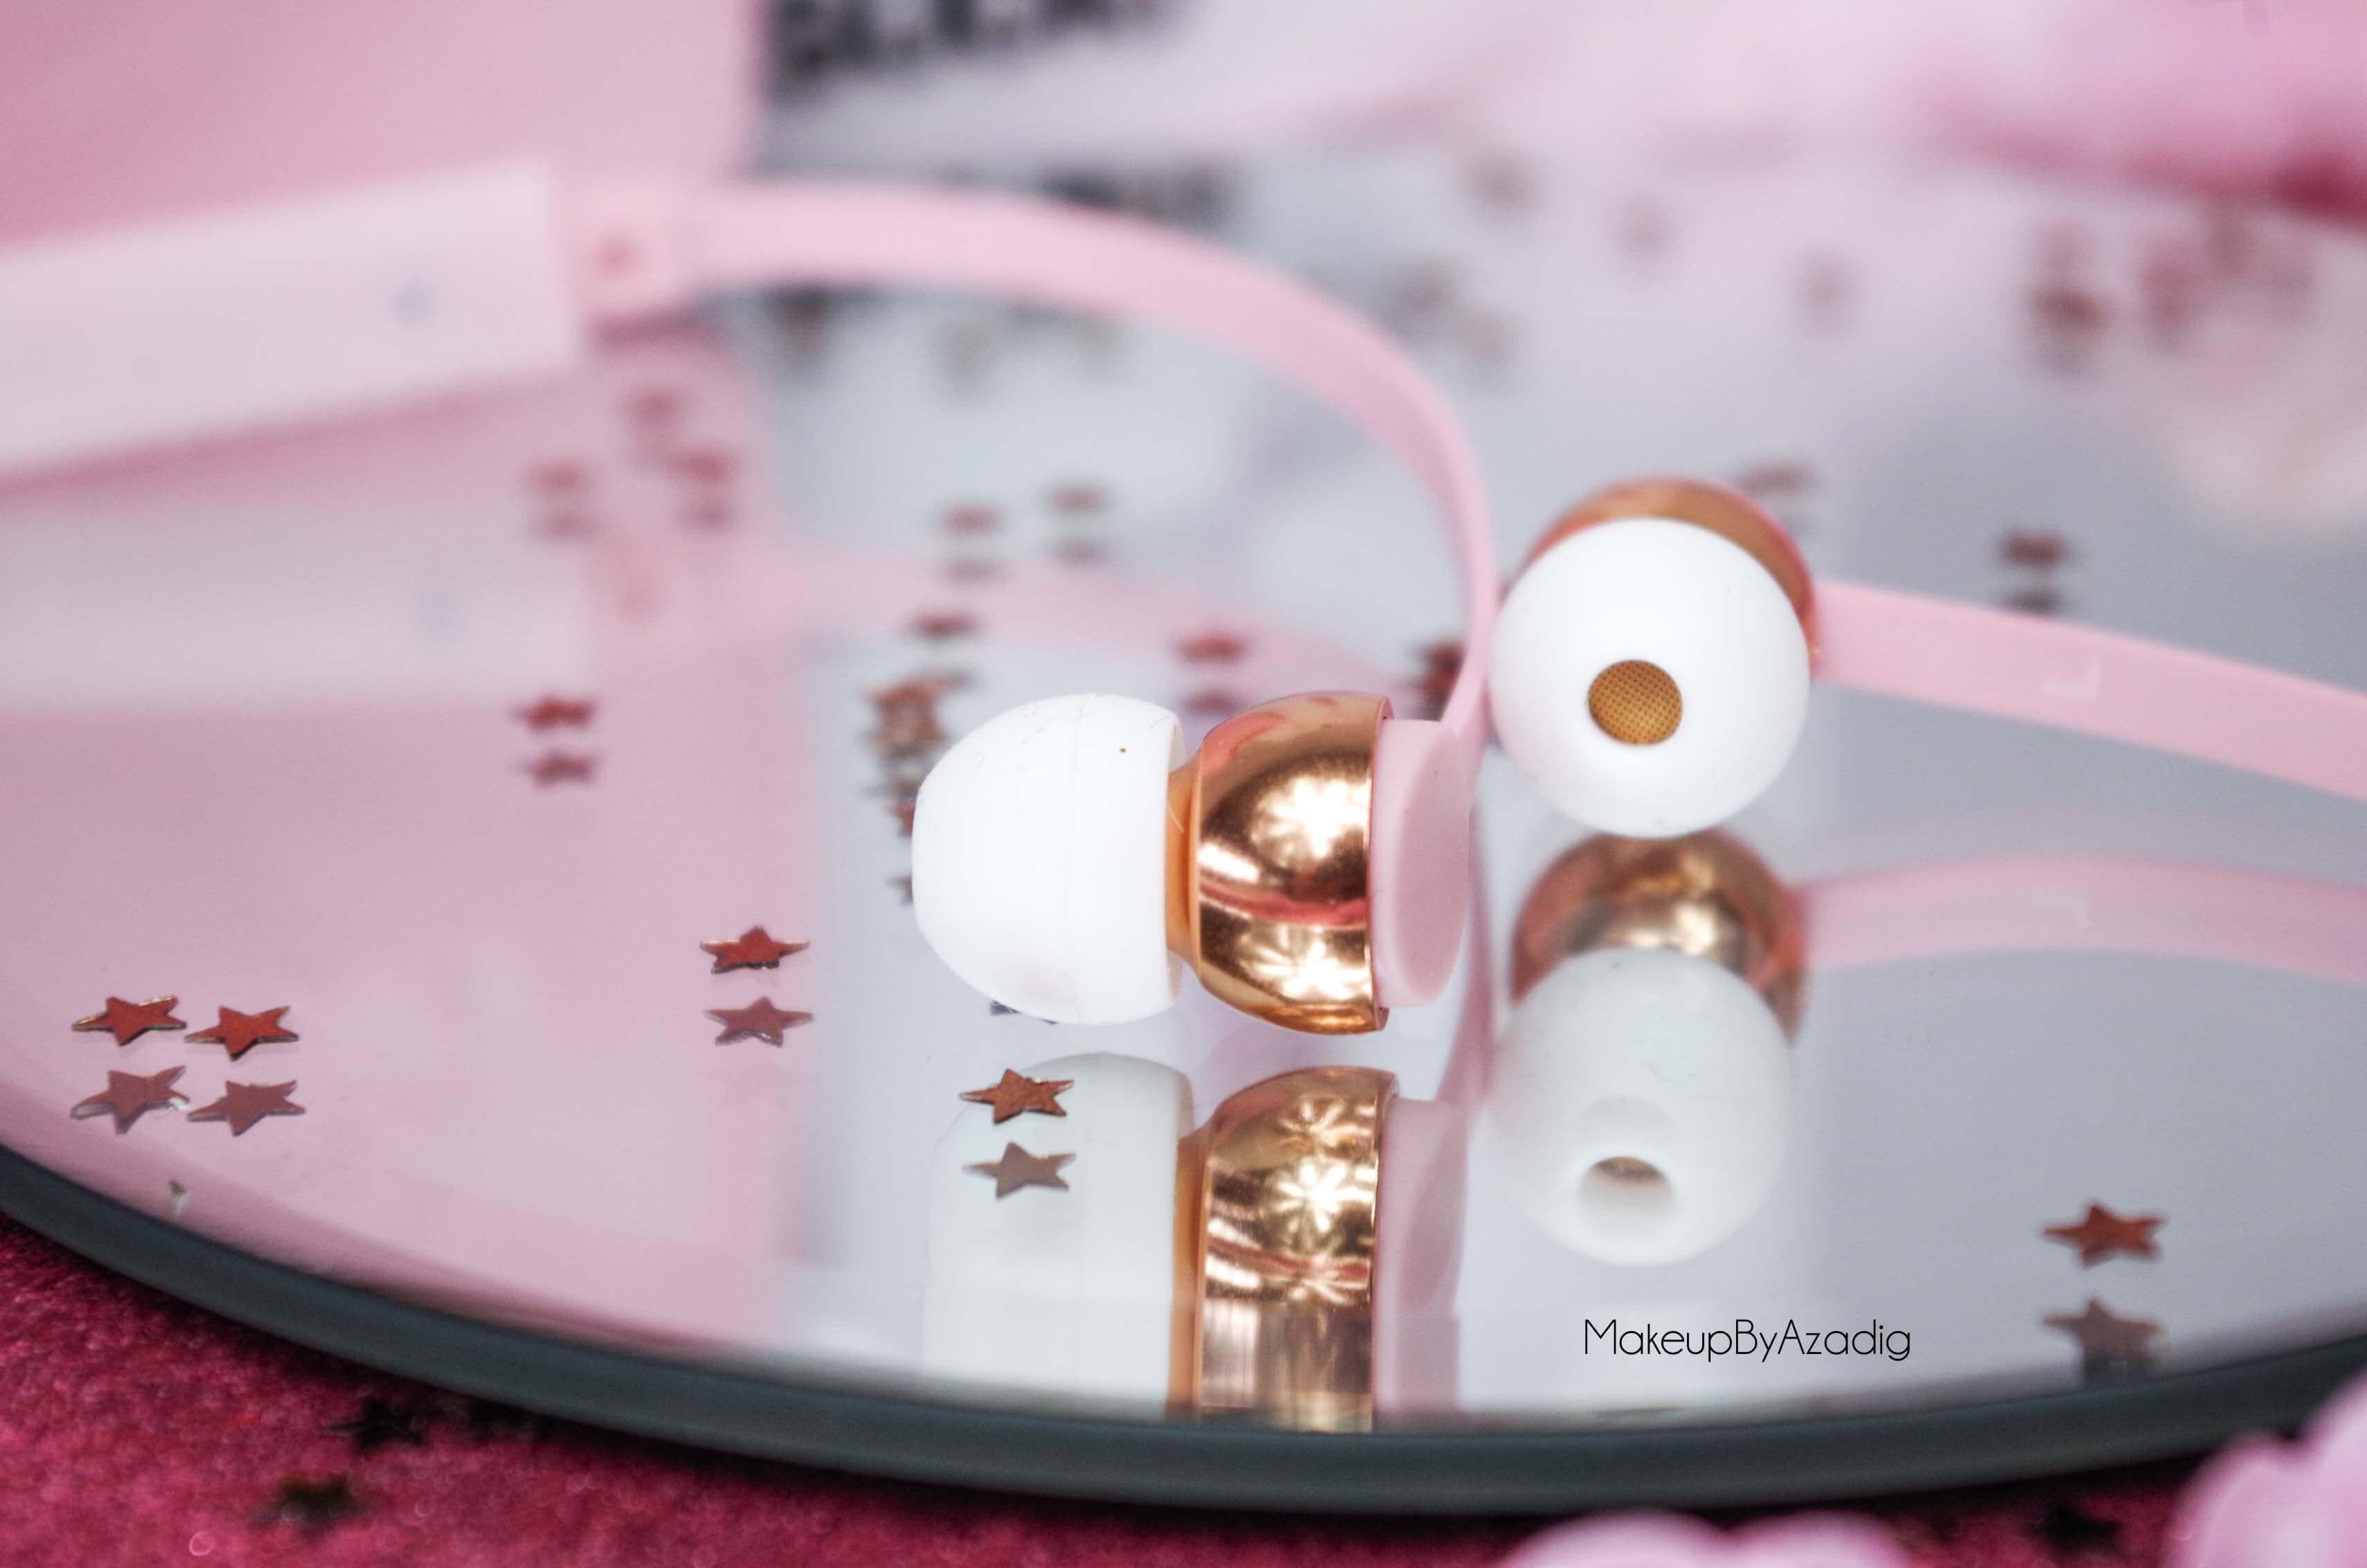 ecouteurs-casque-sans-fil-bluetooth-design-tendance-sudio-sweden-rose-vasa-bla-makeupbyazadig-avis-prix-rosegold